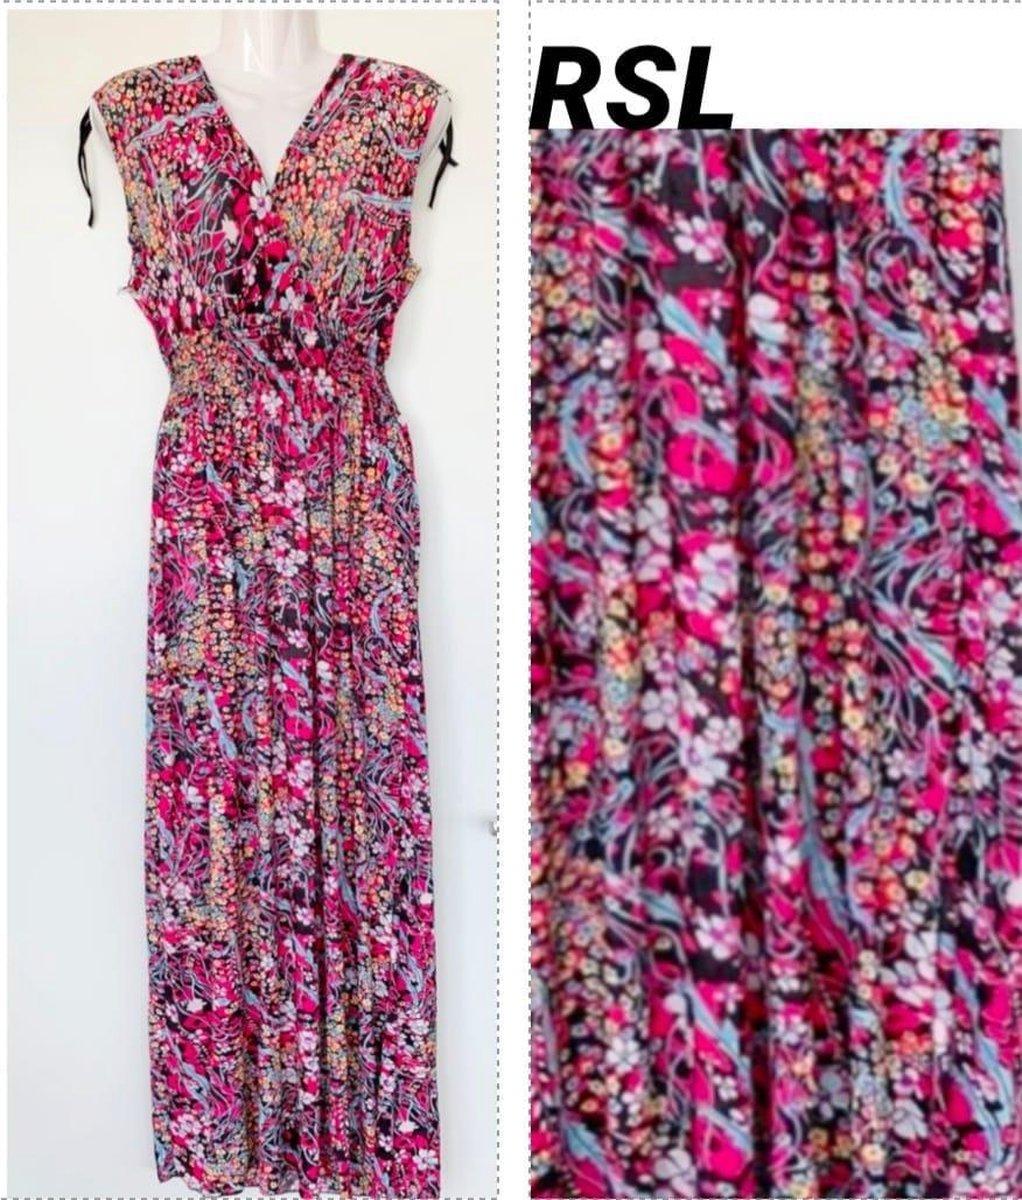 Dames jurk met bloemenprint one size roze/zwart